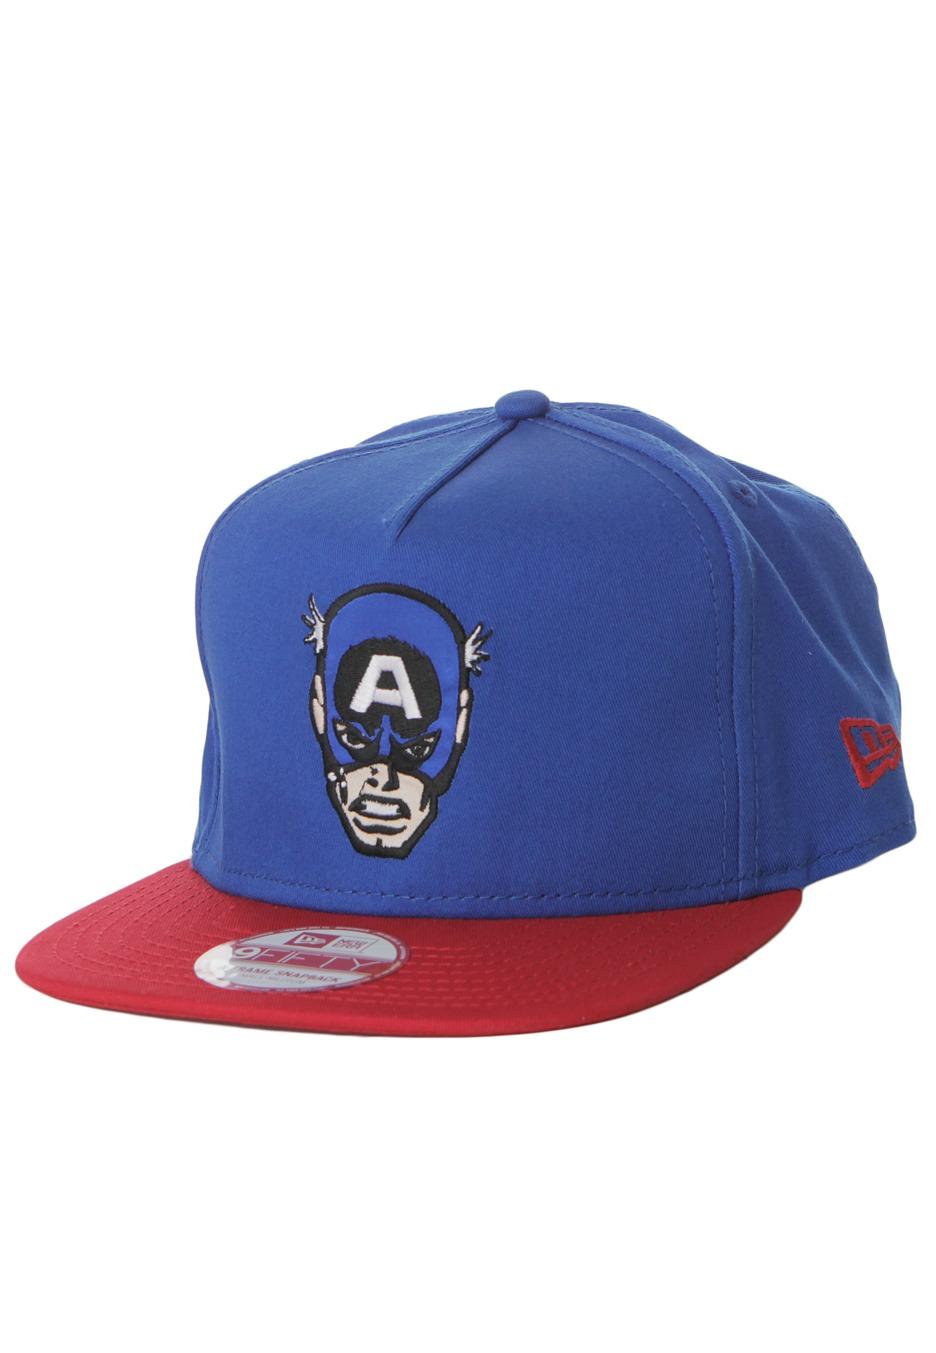 New Era - Hero Face Captain America Blue/Red Snapback - Cap